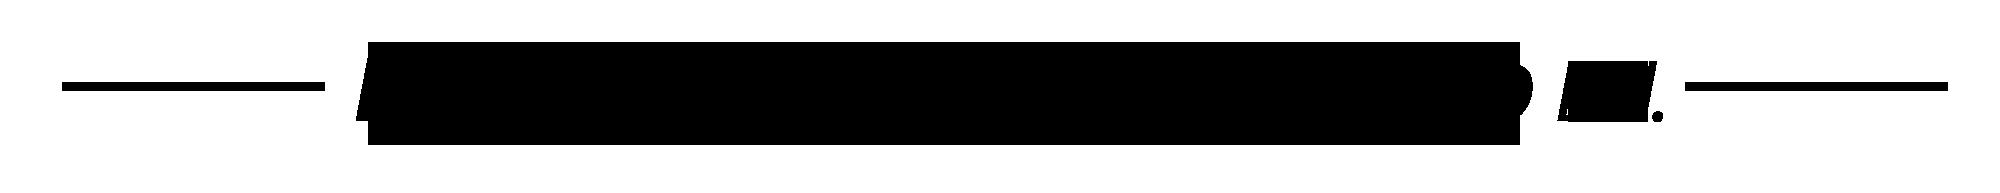 People Management Group Ltd logo